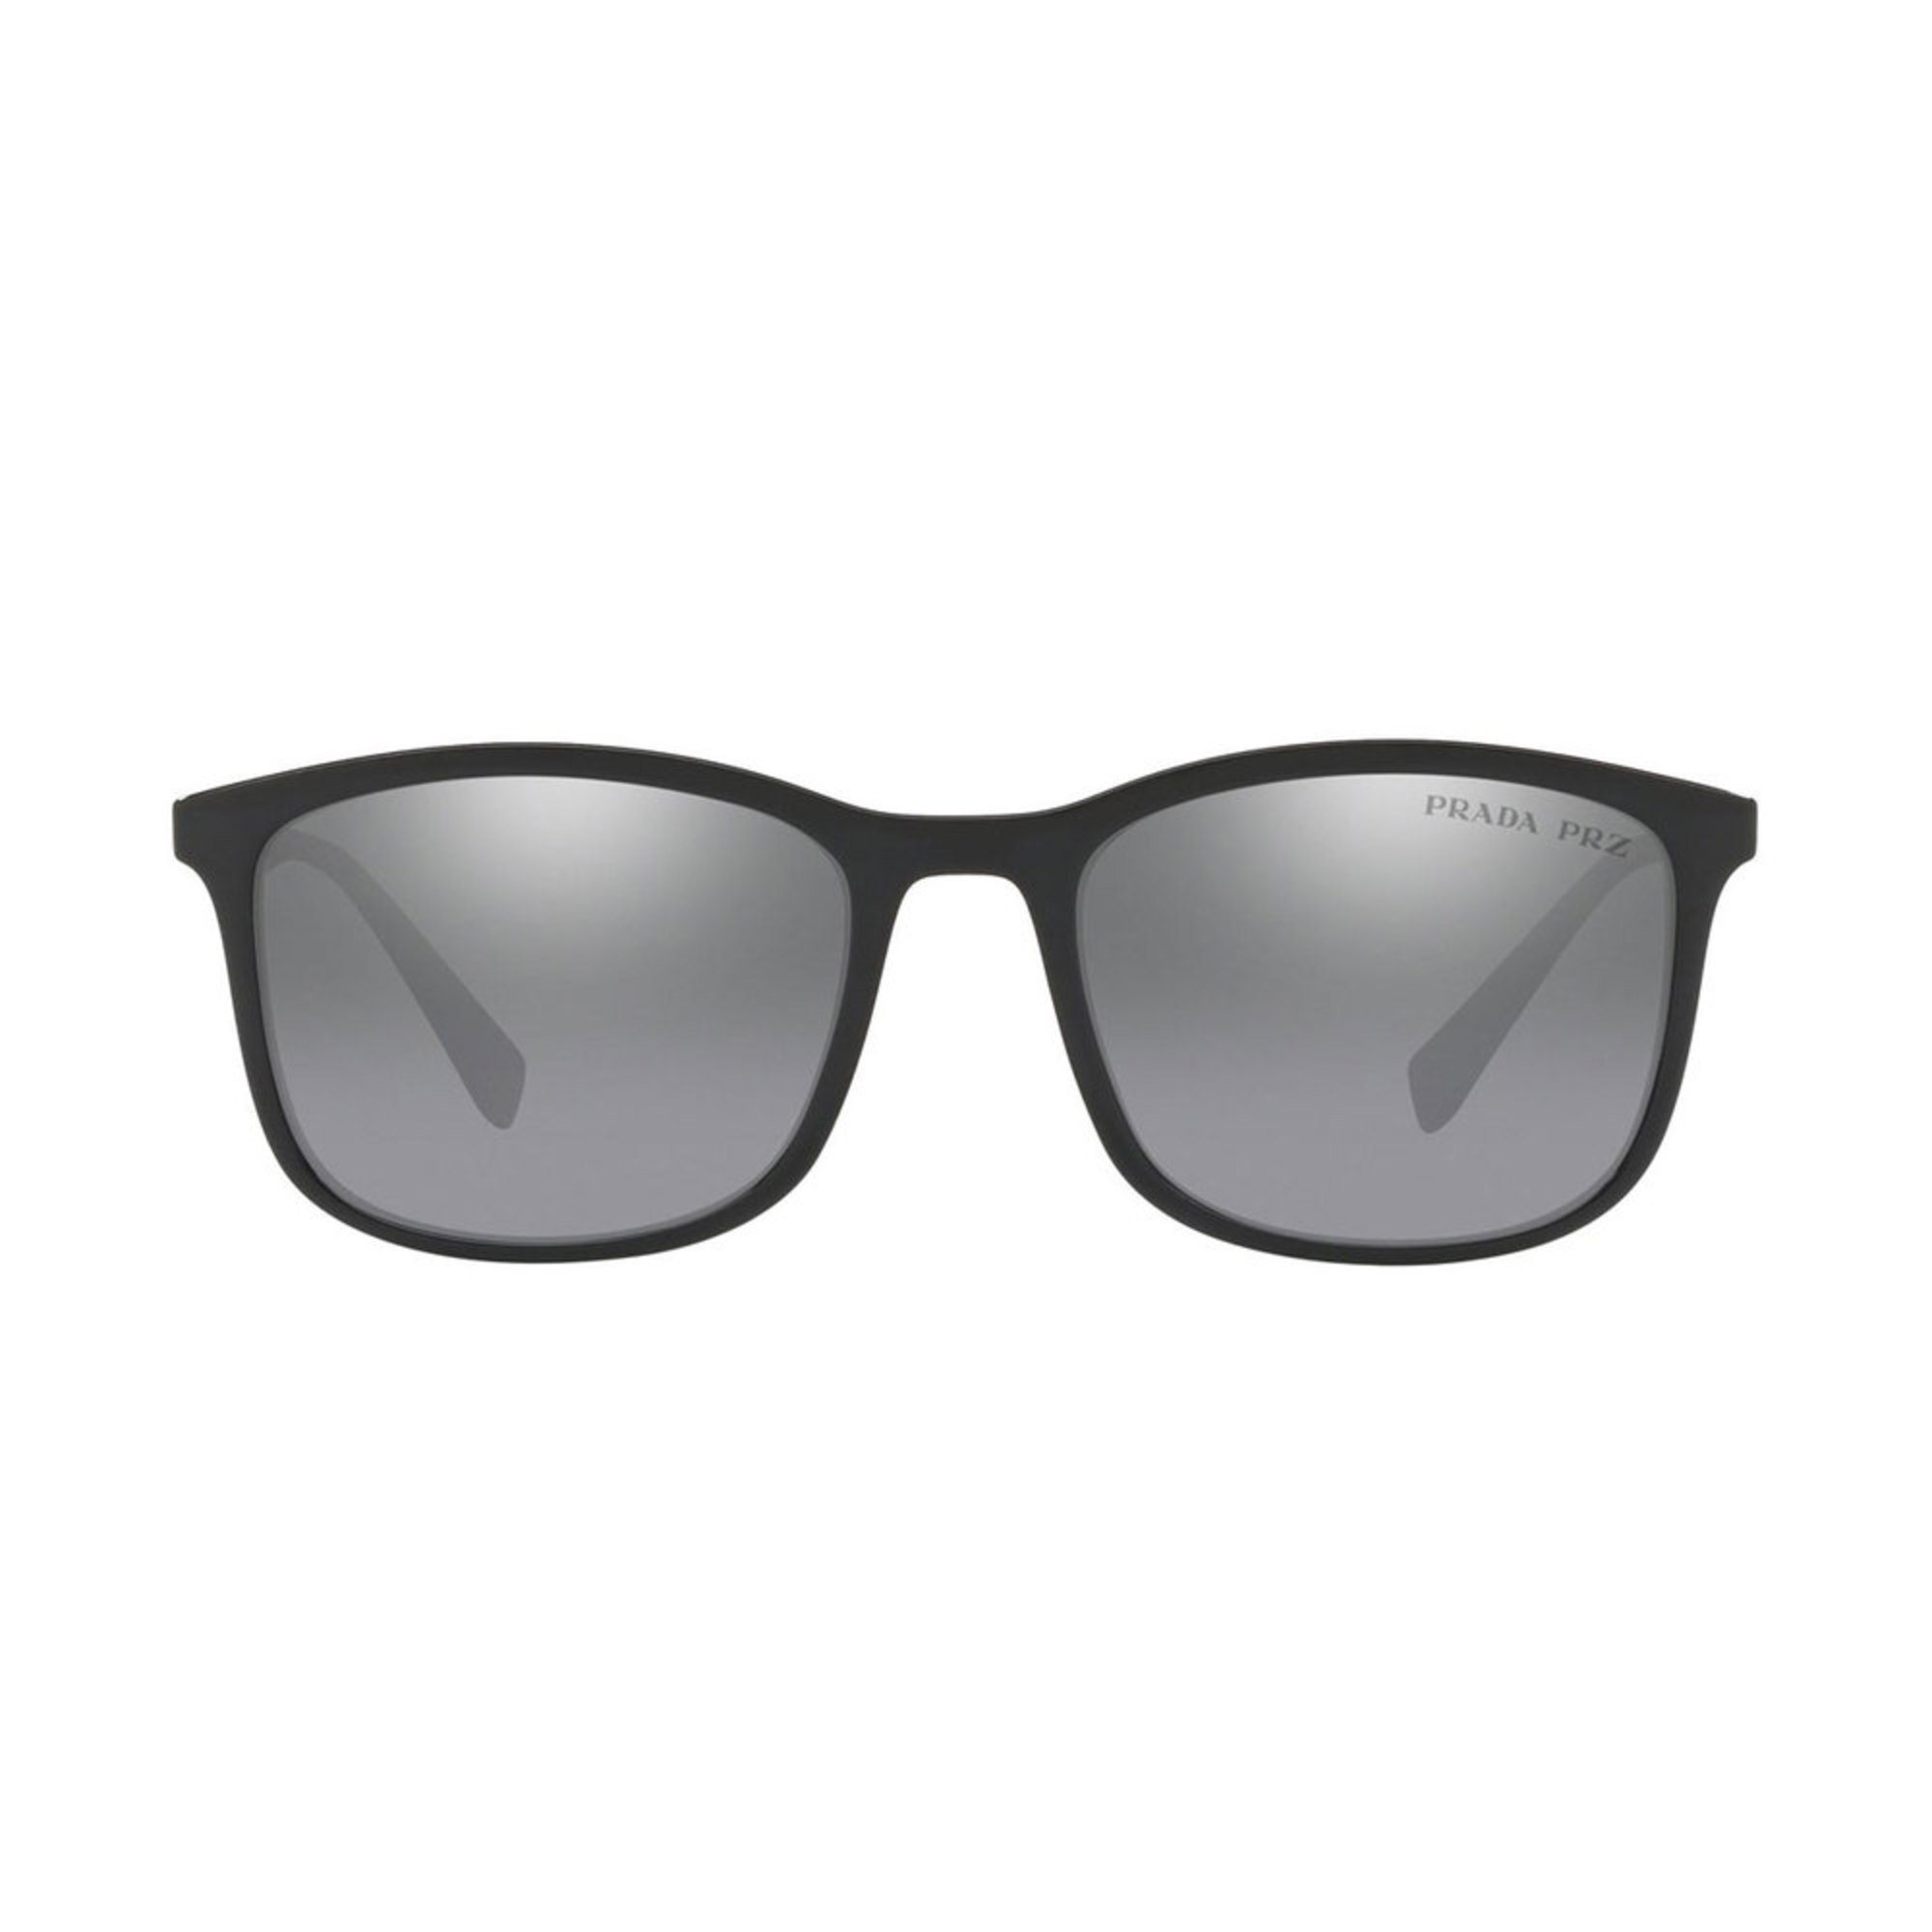 54c4d1004a4b Prada Men's Polarized Rectangle Sunglasses   Men's Sunglasses ...